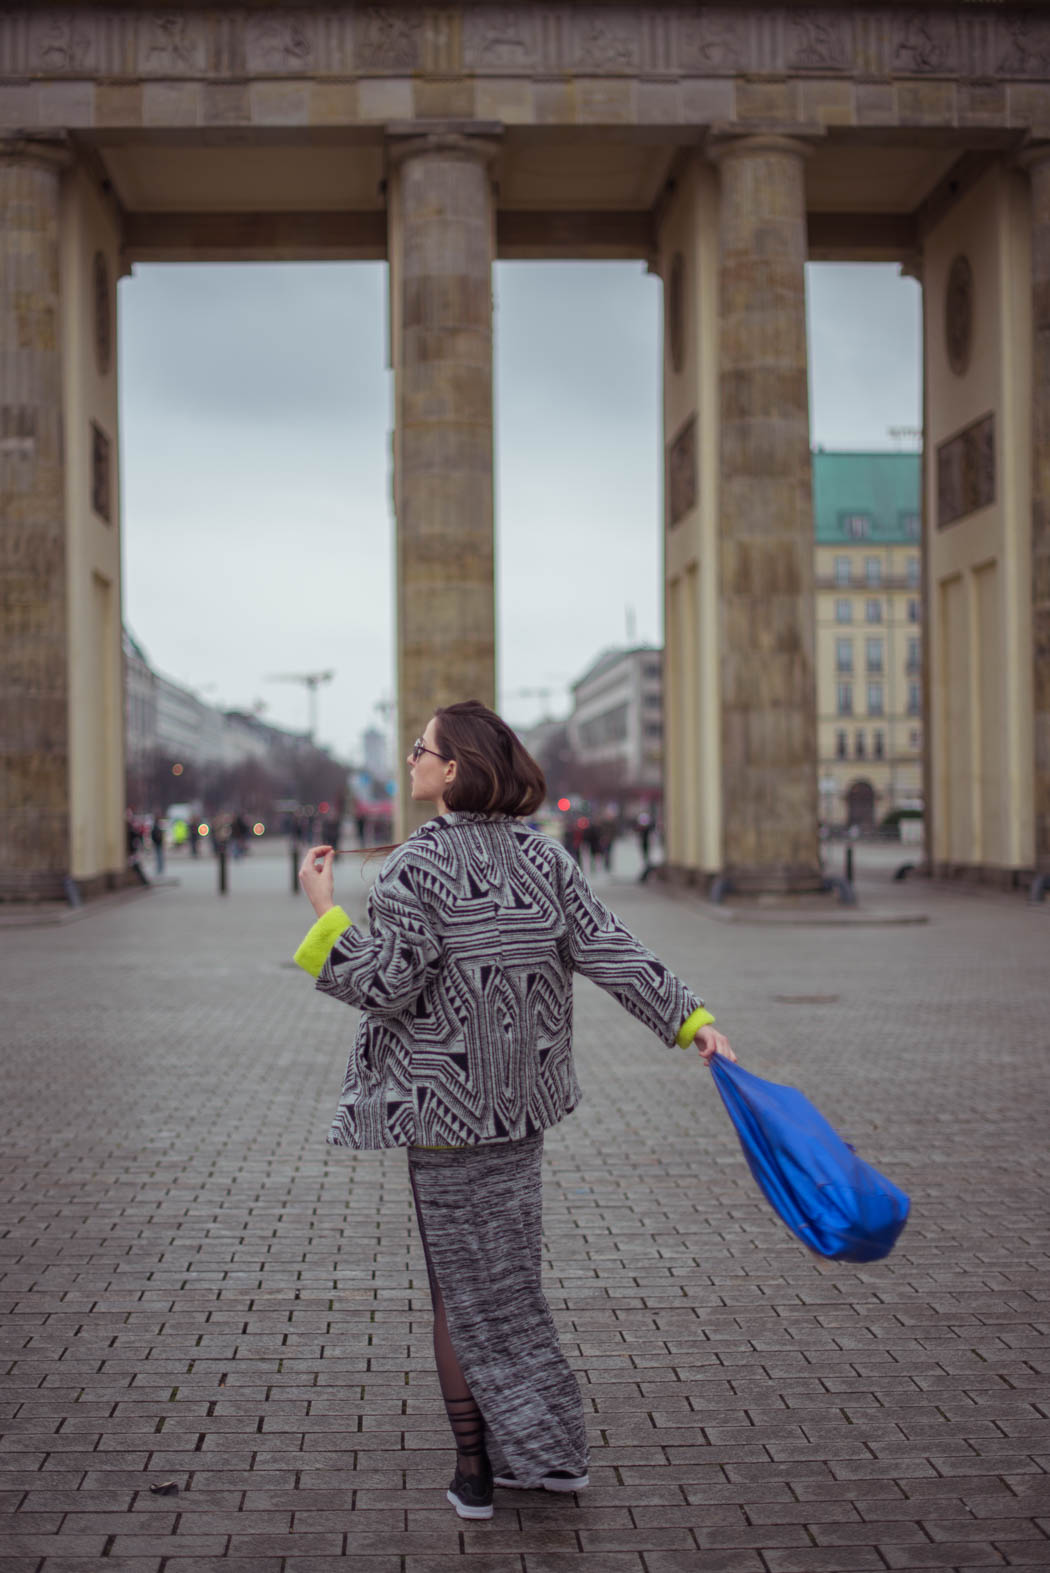 Dior-so-real-neongrüner-Pullover-Cos-Fashionblogger-München-Berlin-Deutschland-Lindarella-Streetstyle-5